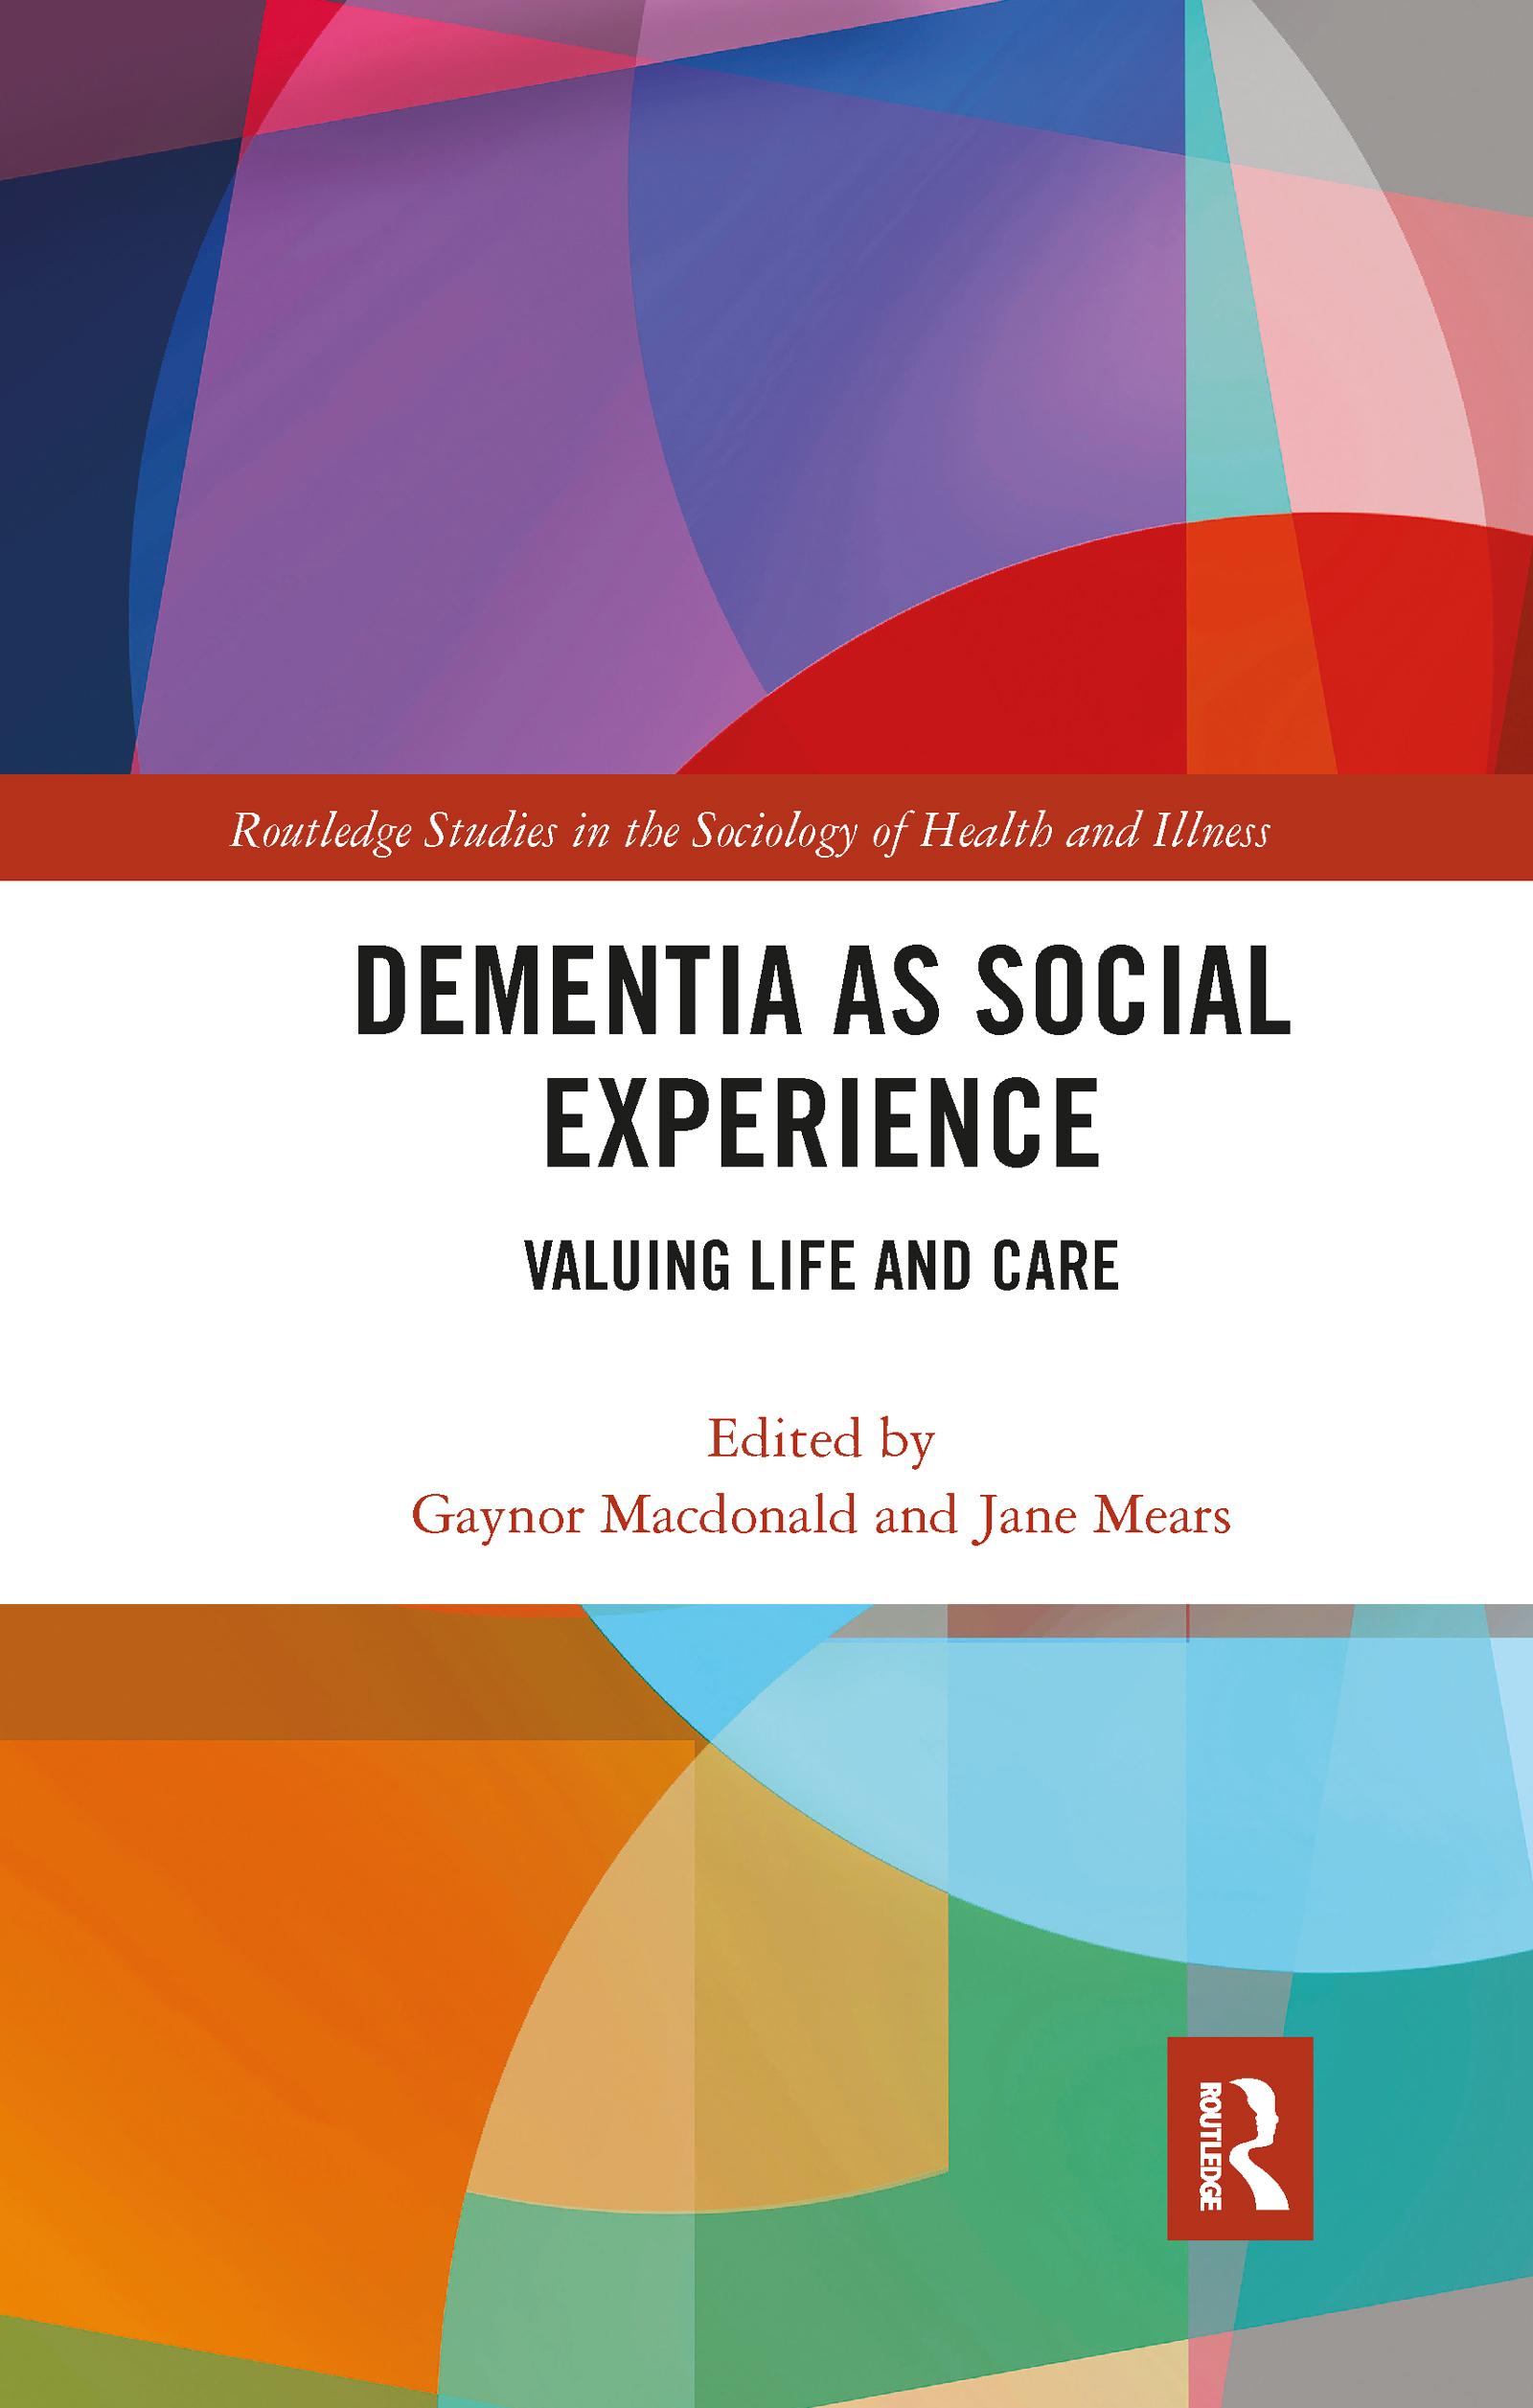 Dementia as Social Experience